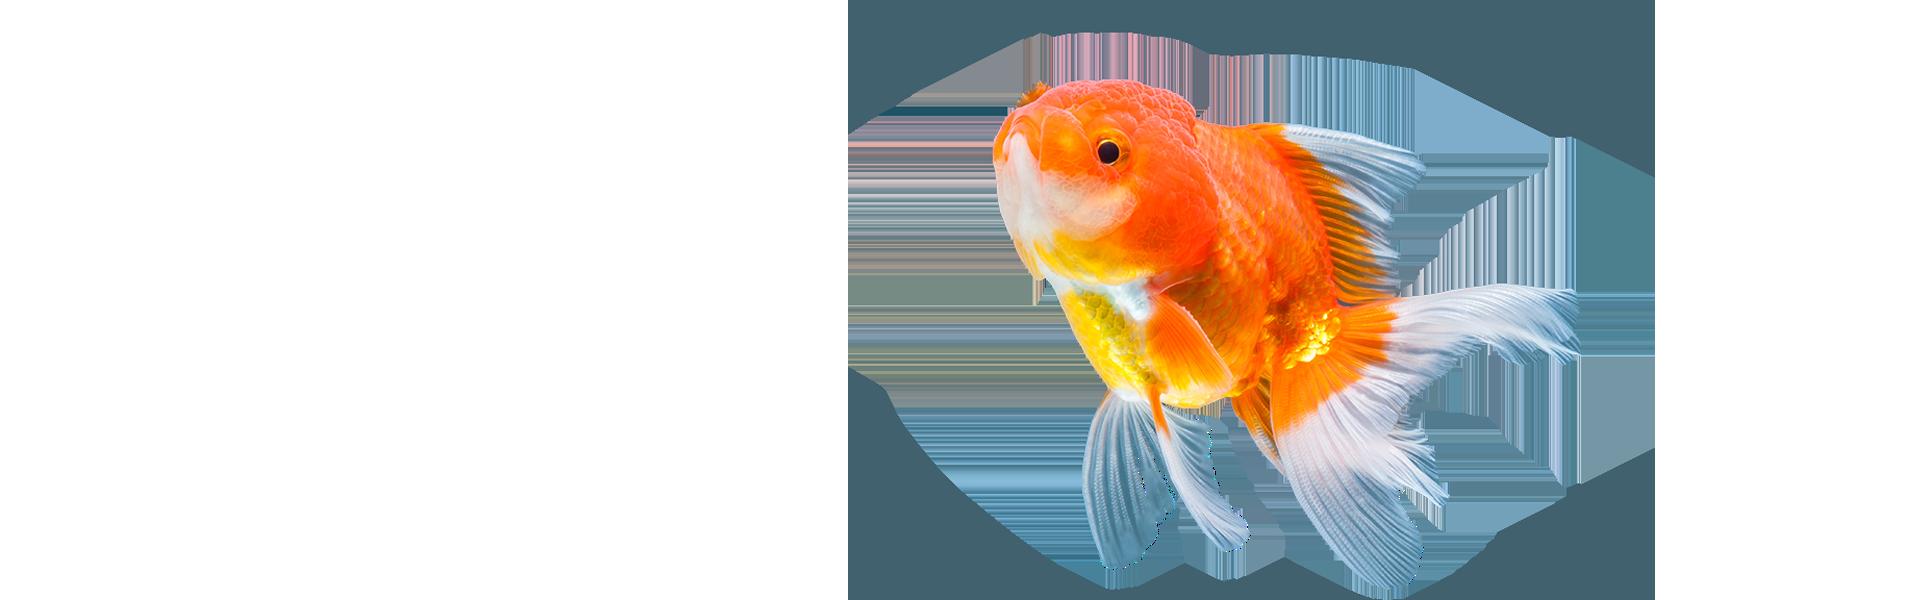 sunny articulos para mascota seccion pez - Sunny | Productos y Accesorios para Peceras de Agua Dulce | México